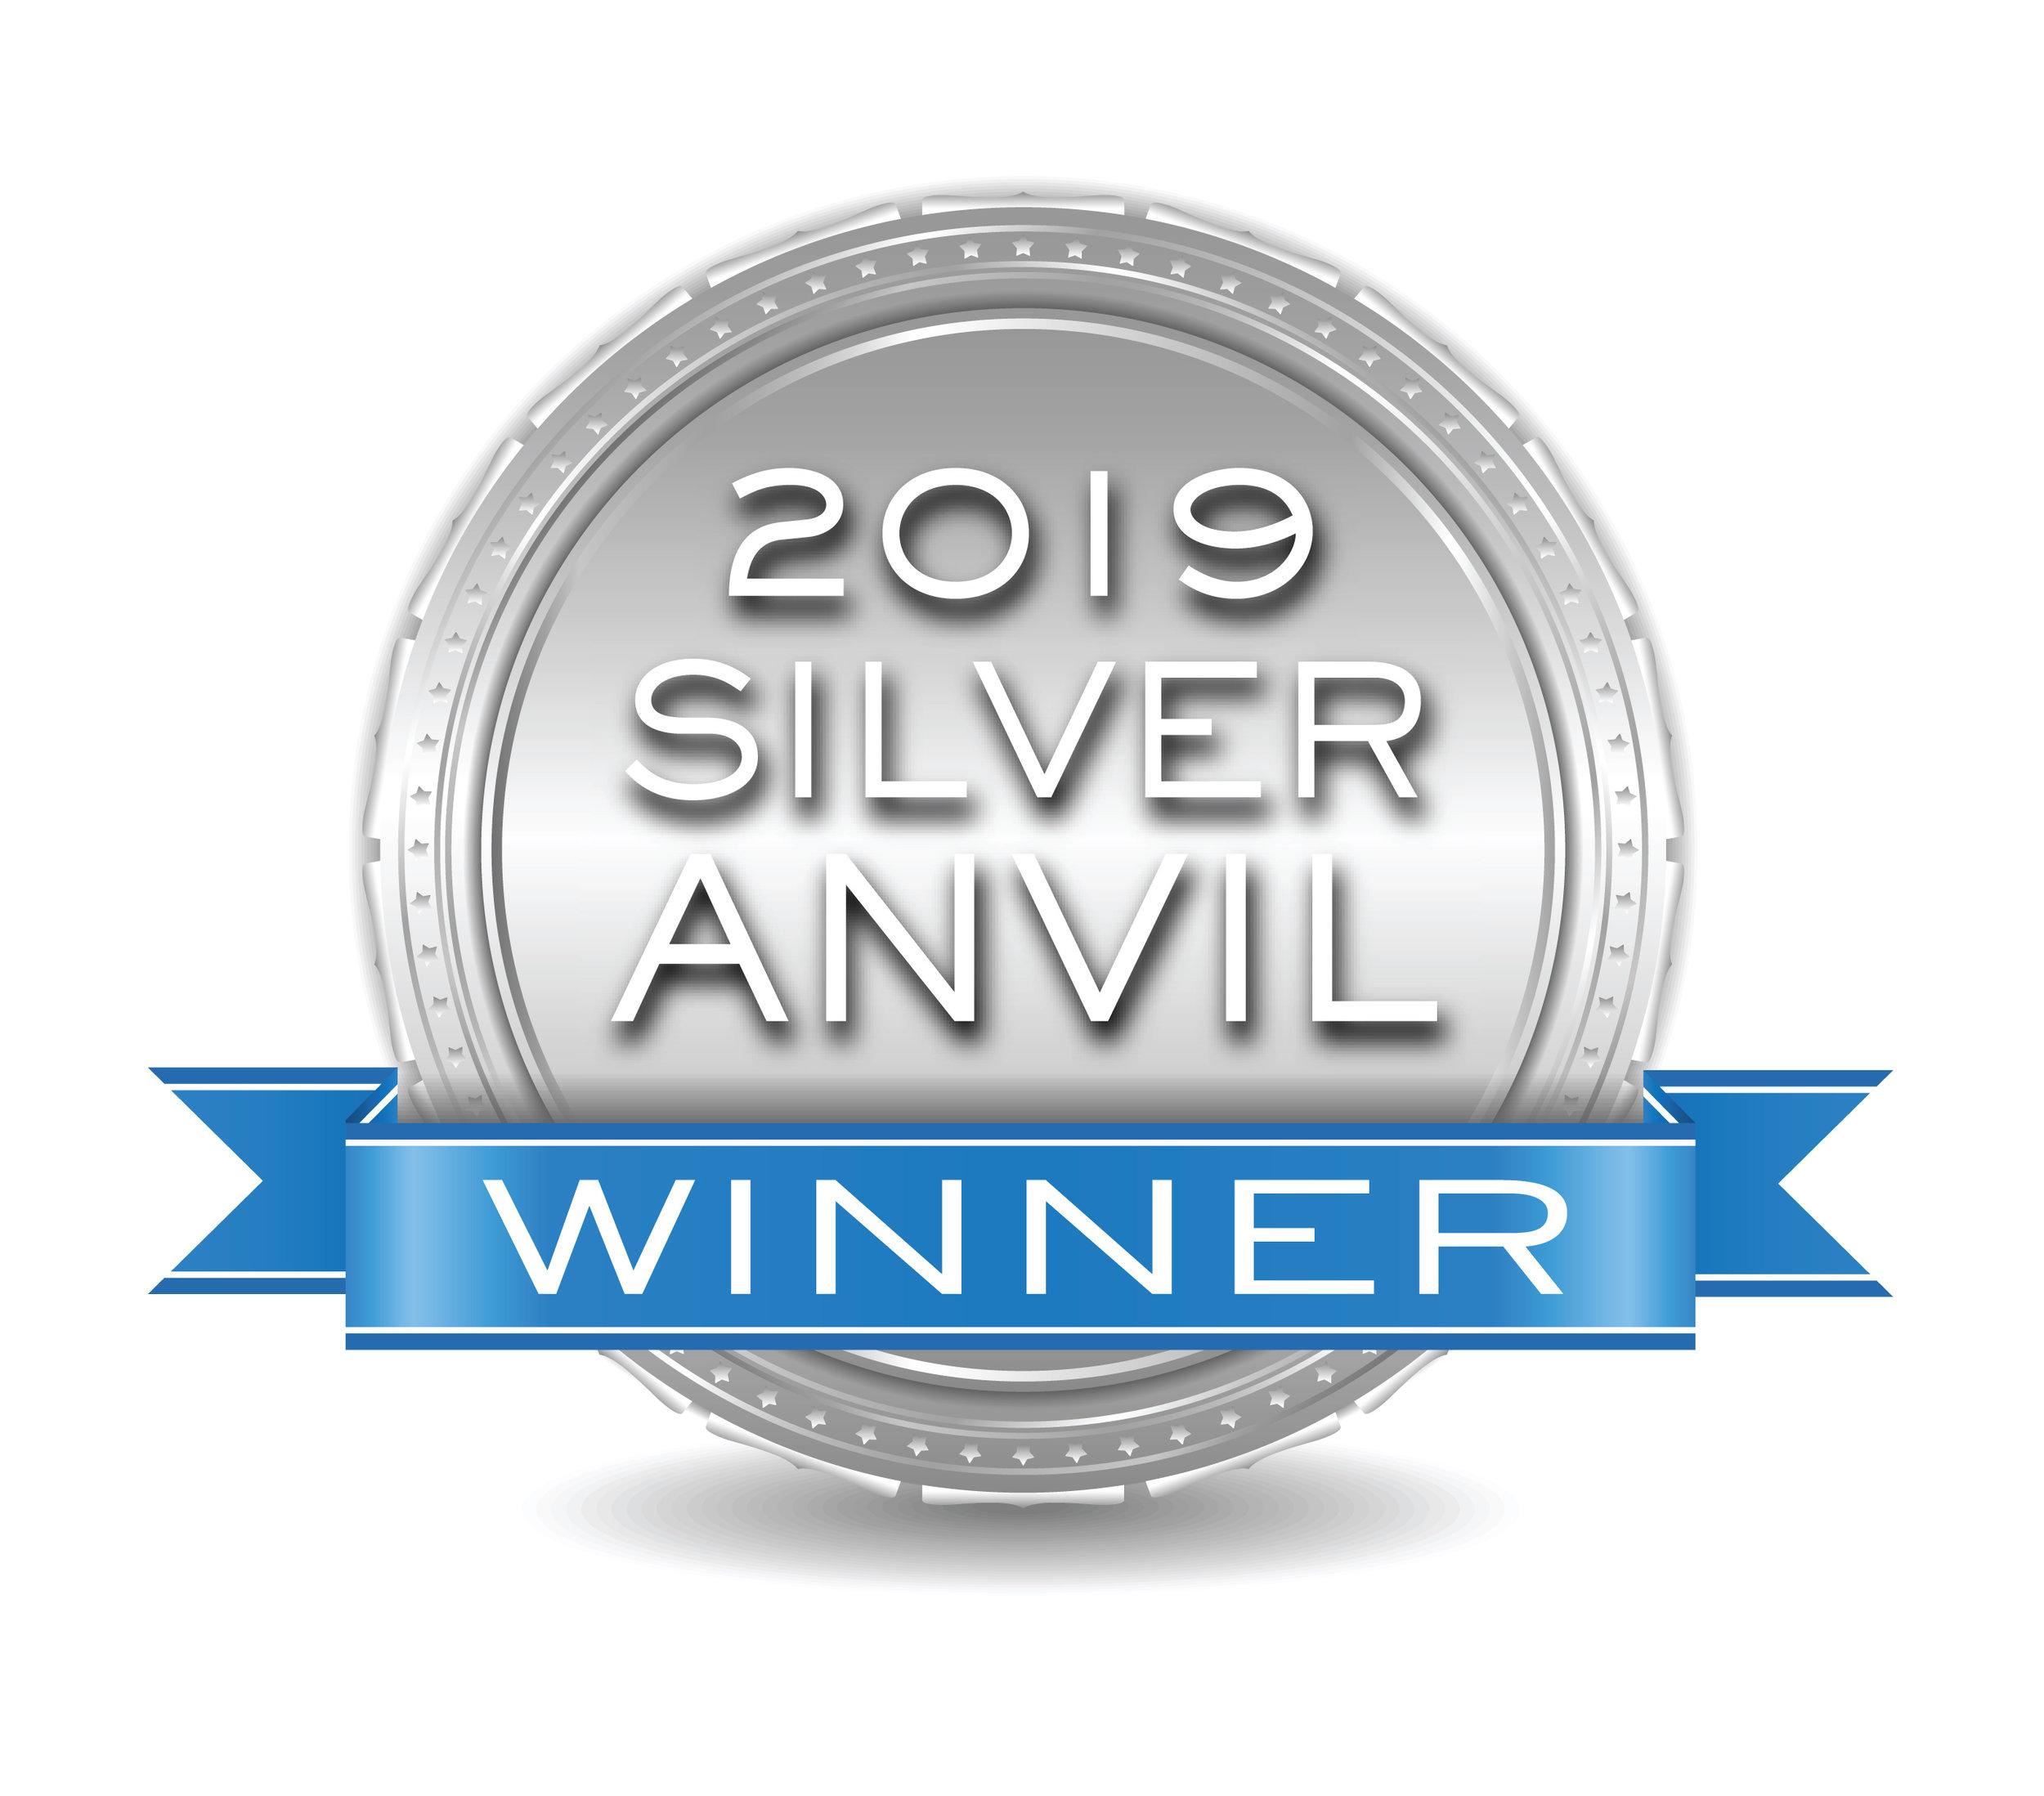 2019 Silver Anvil Winner.jpg